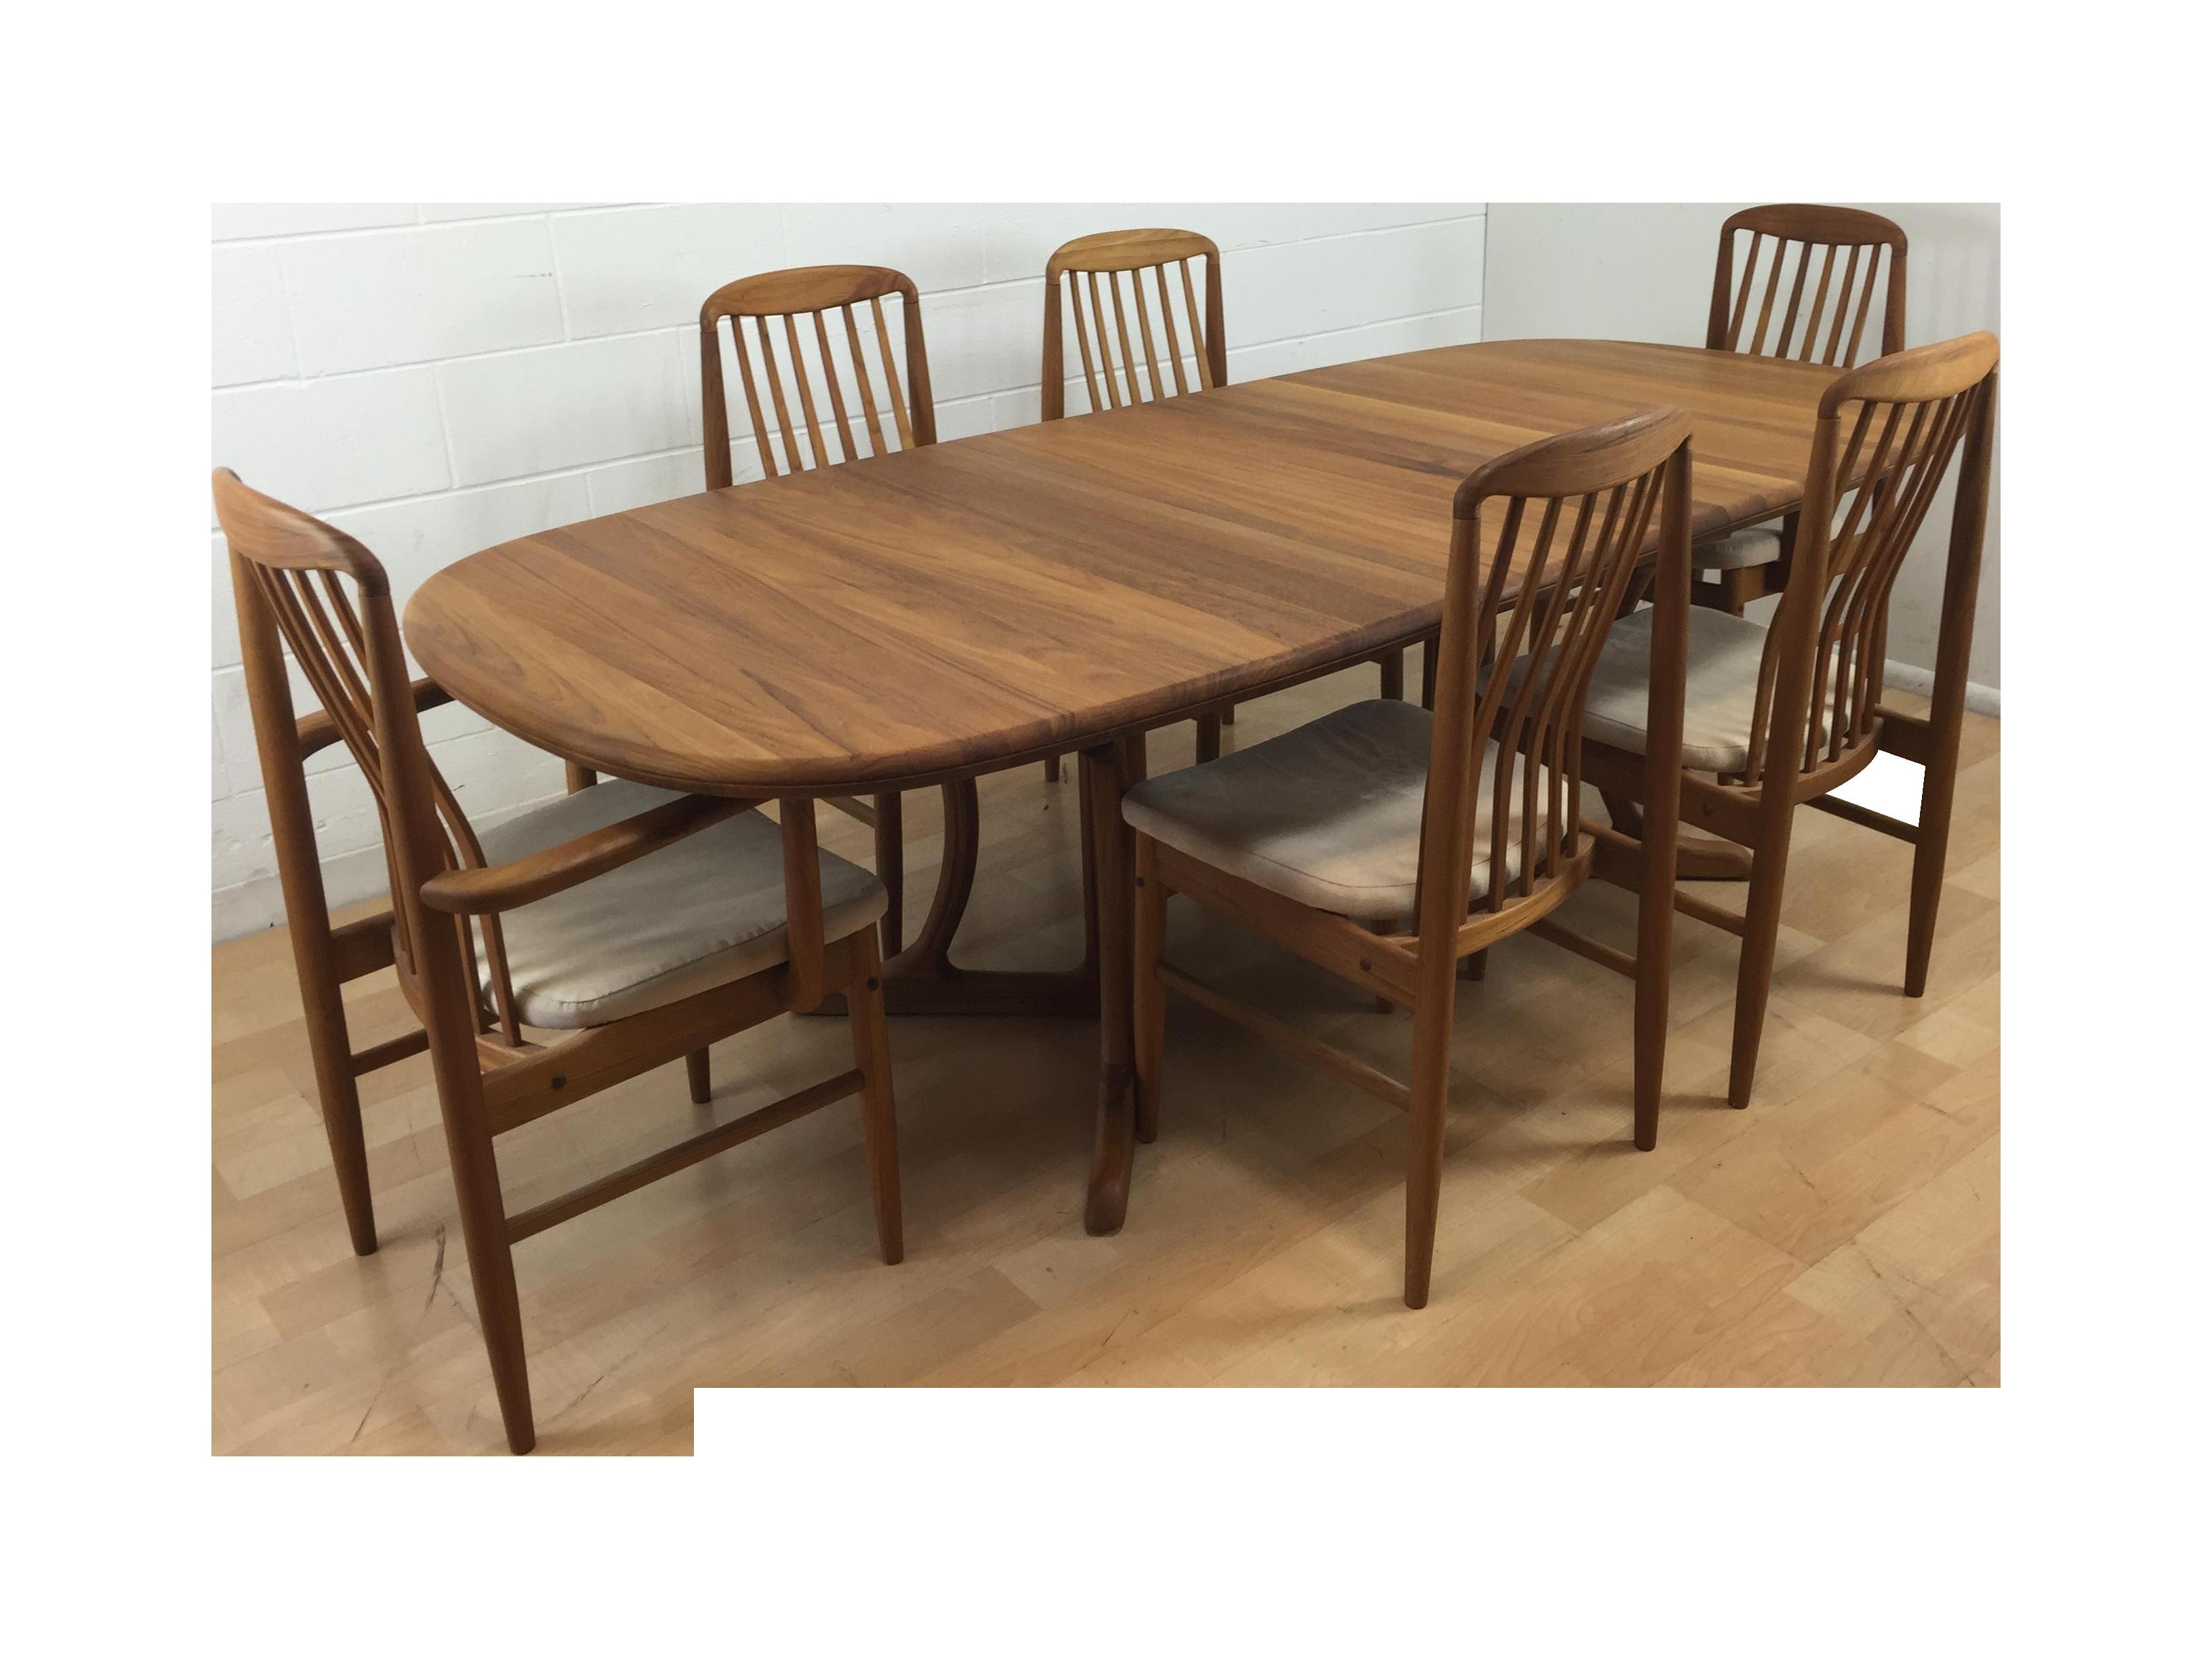 Benny linden mid century modern teak dining set chairish